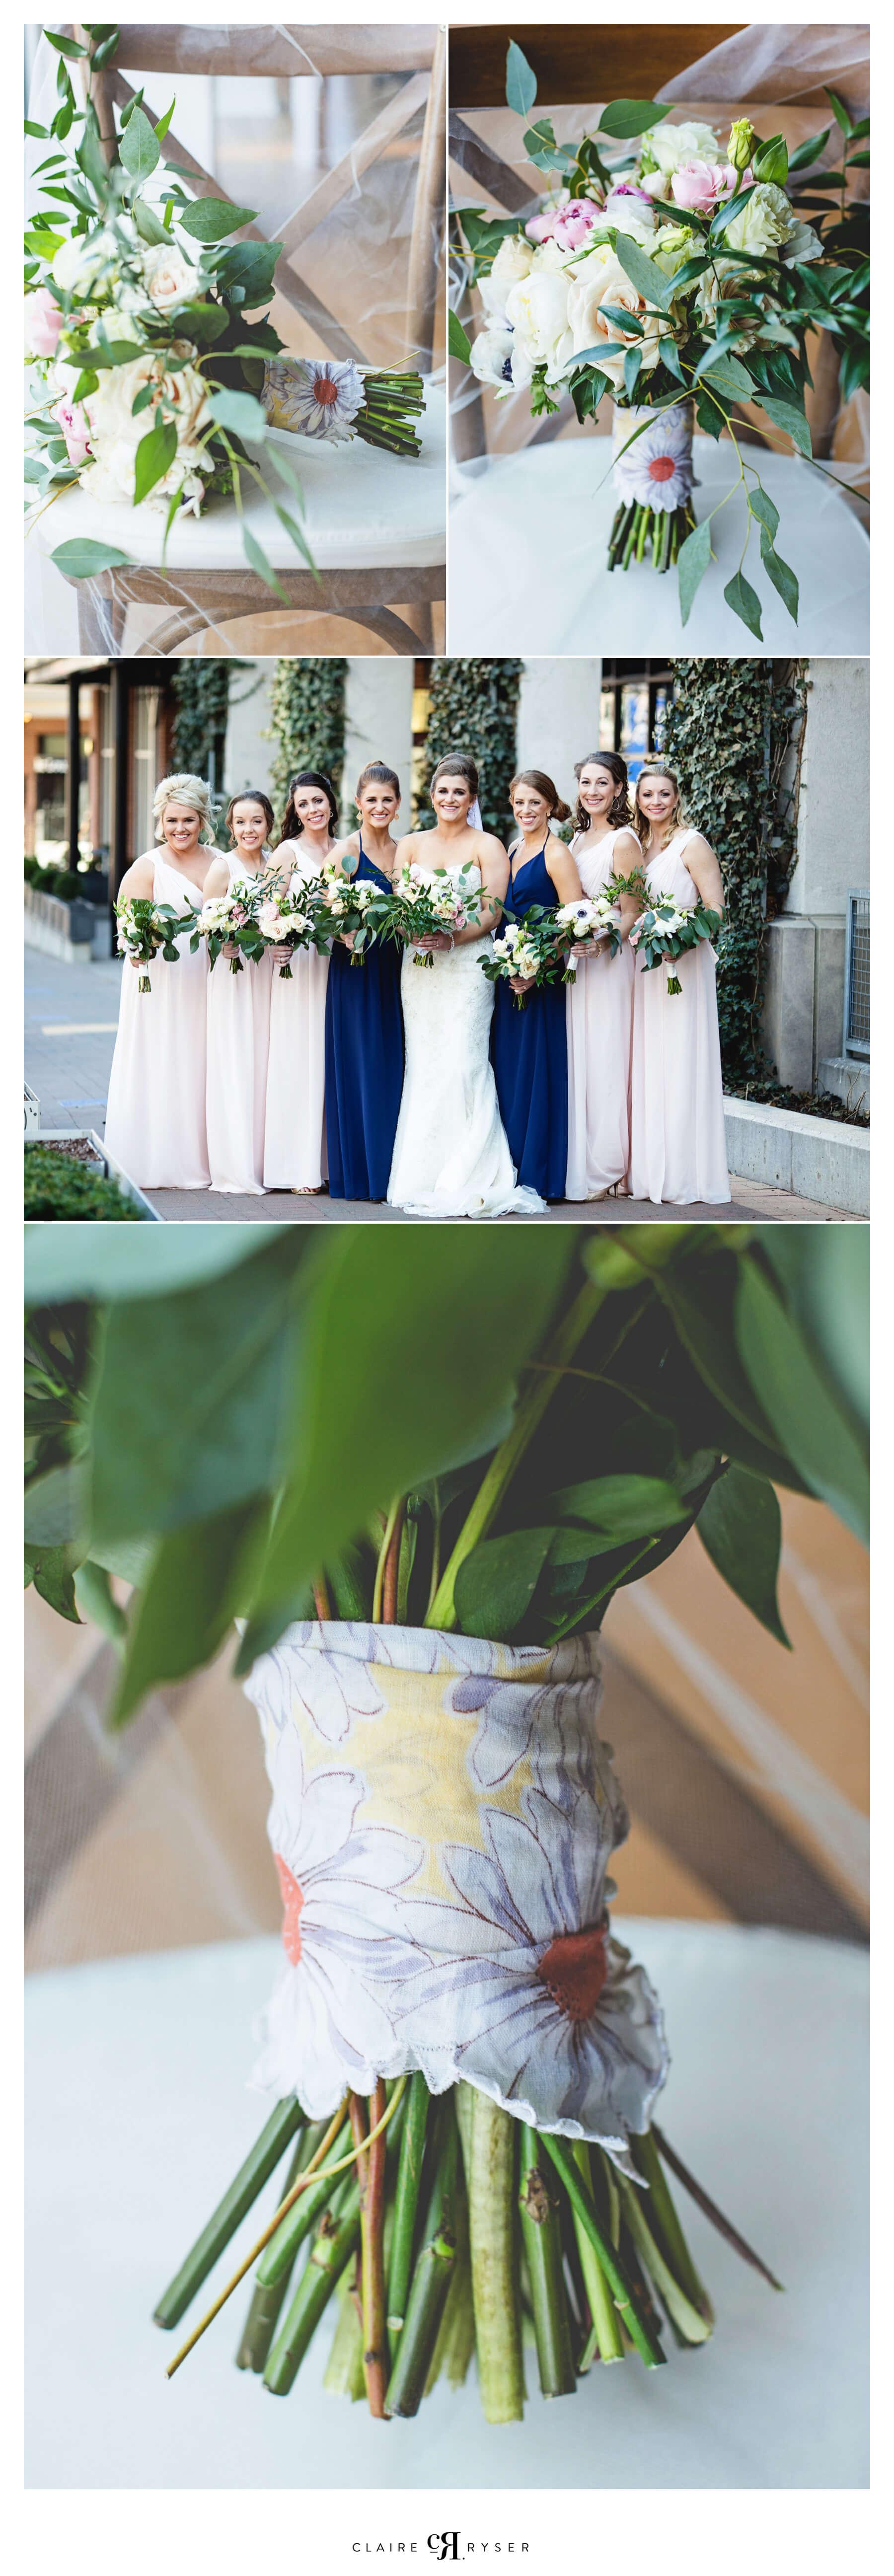 Kansas-City-Wedding-Photography-of-Wedding-Bouquet-Ideas-of_2017_ClaireRyser_14.JPG